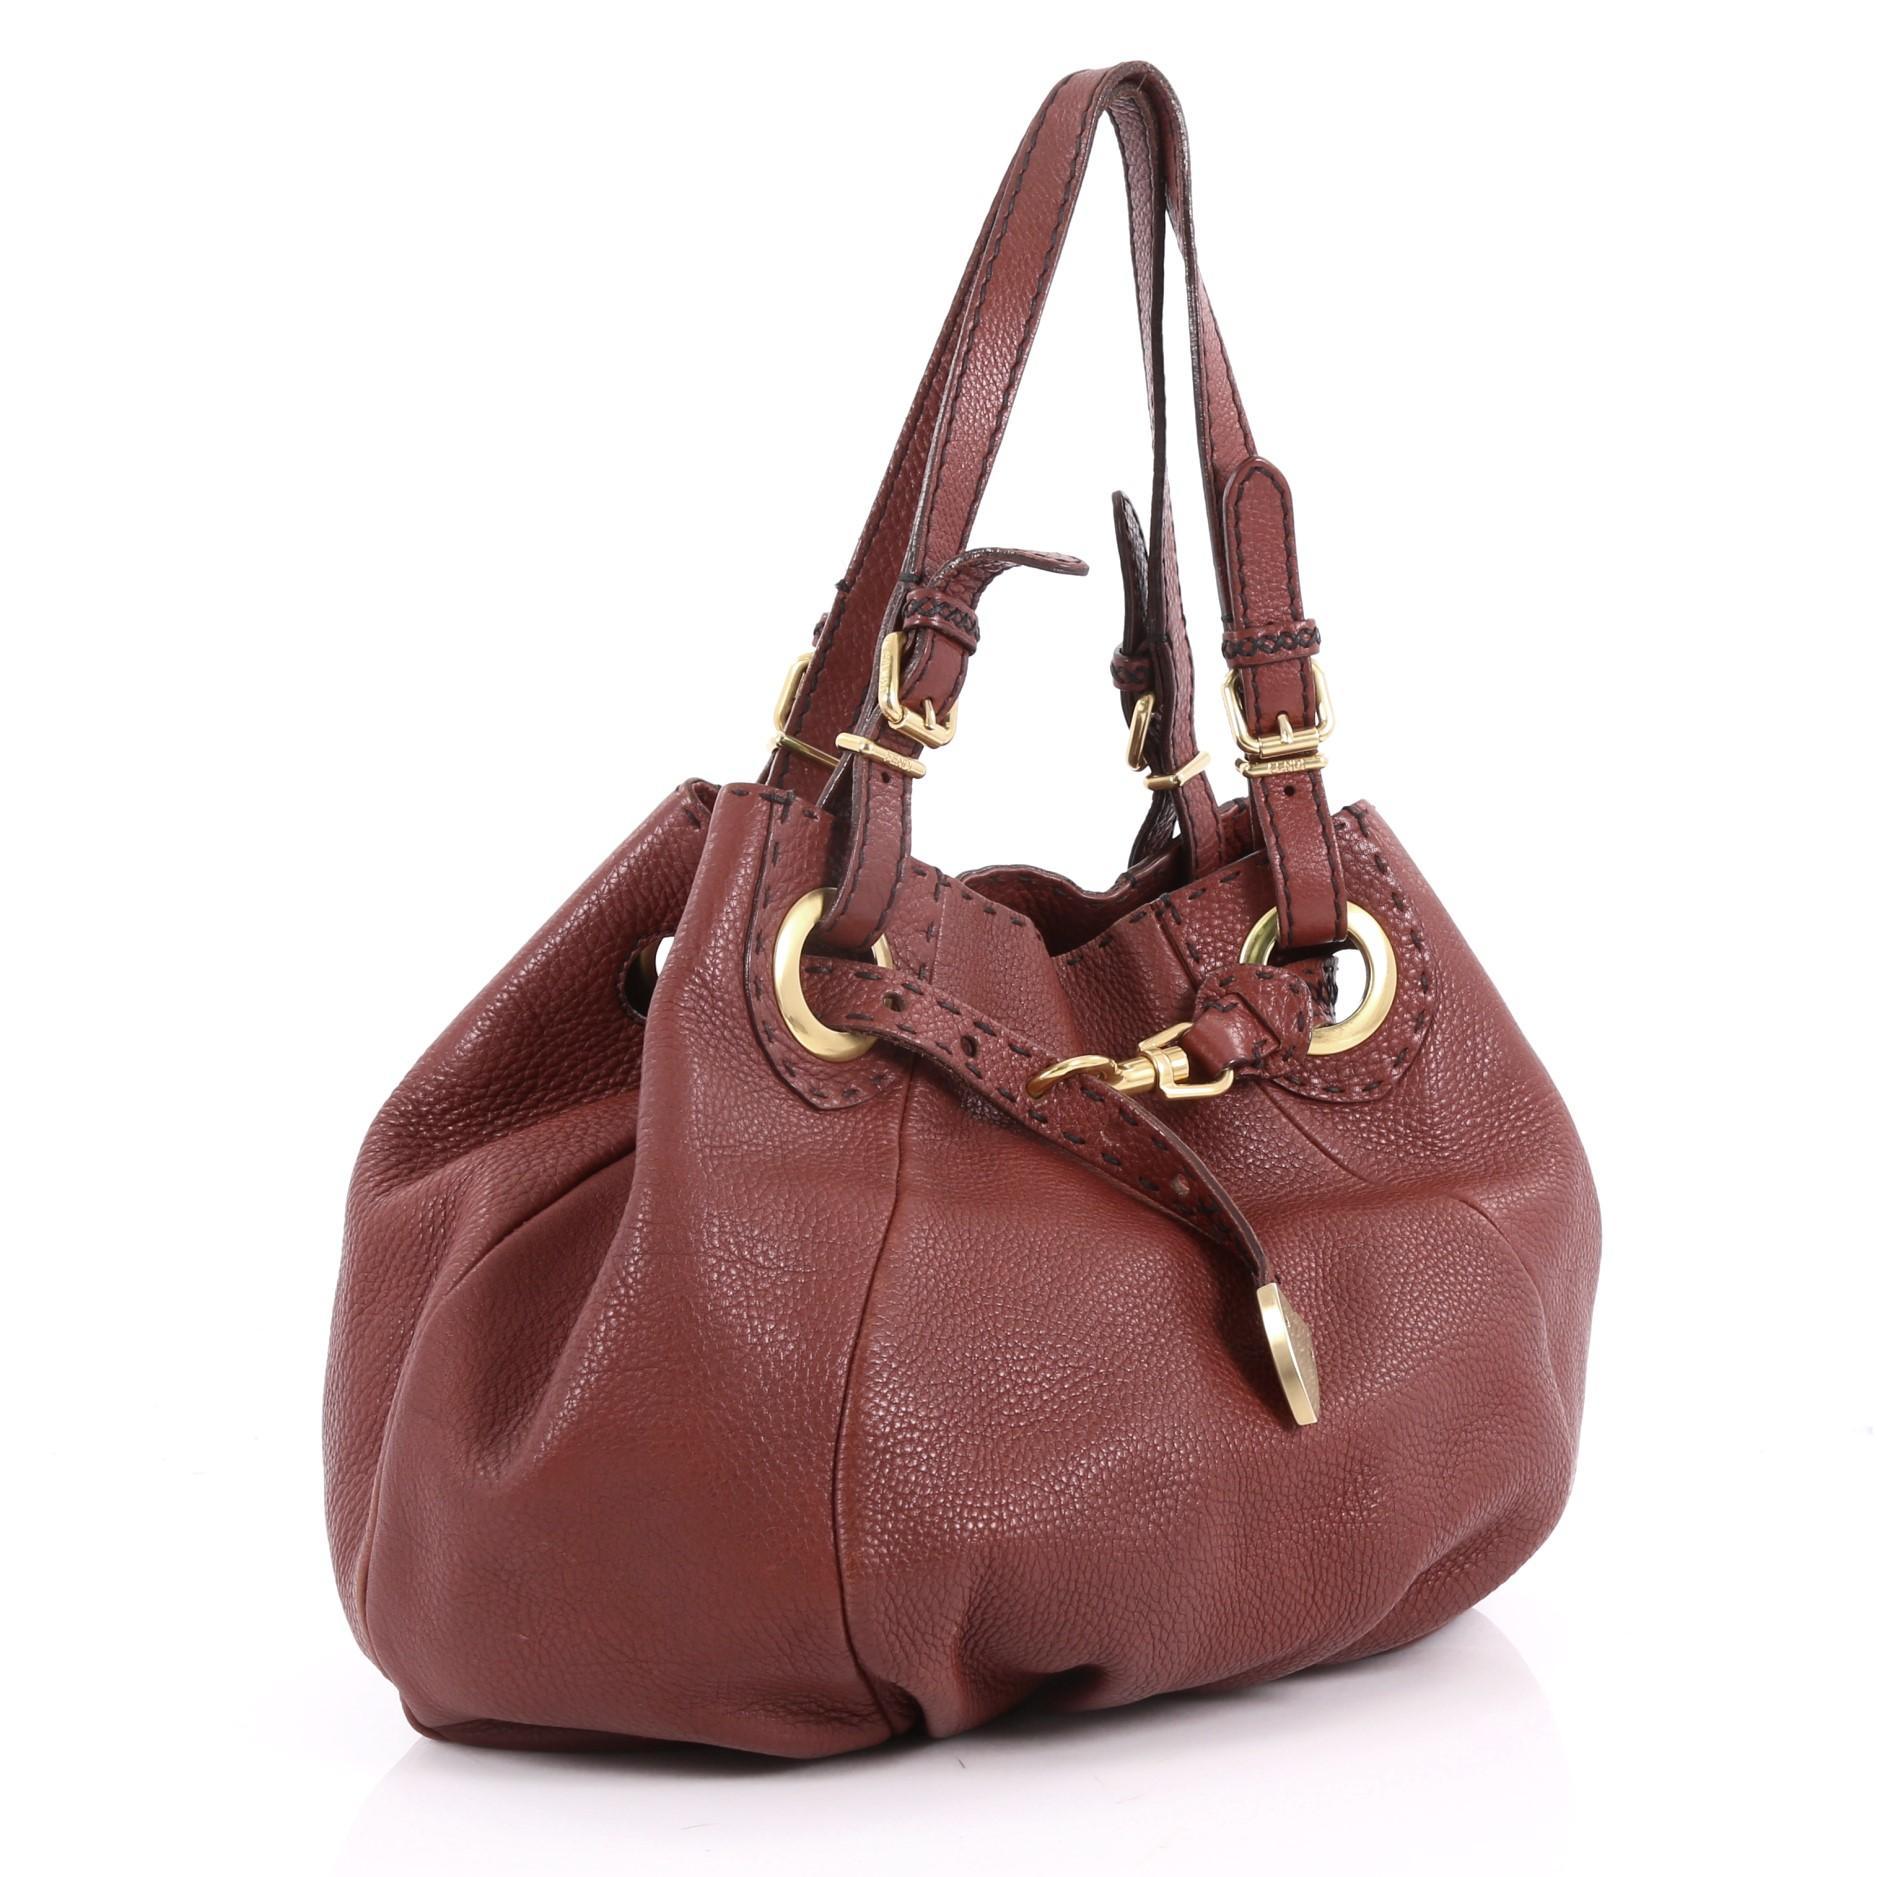 ce23017c0fd9 Fendi Selleria Pomodorino Bag Leather at 1stdibs